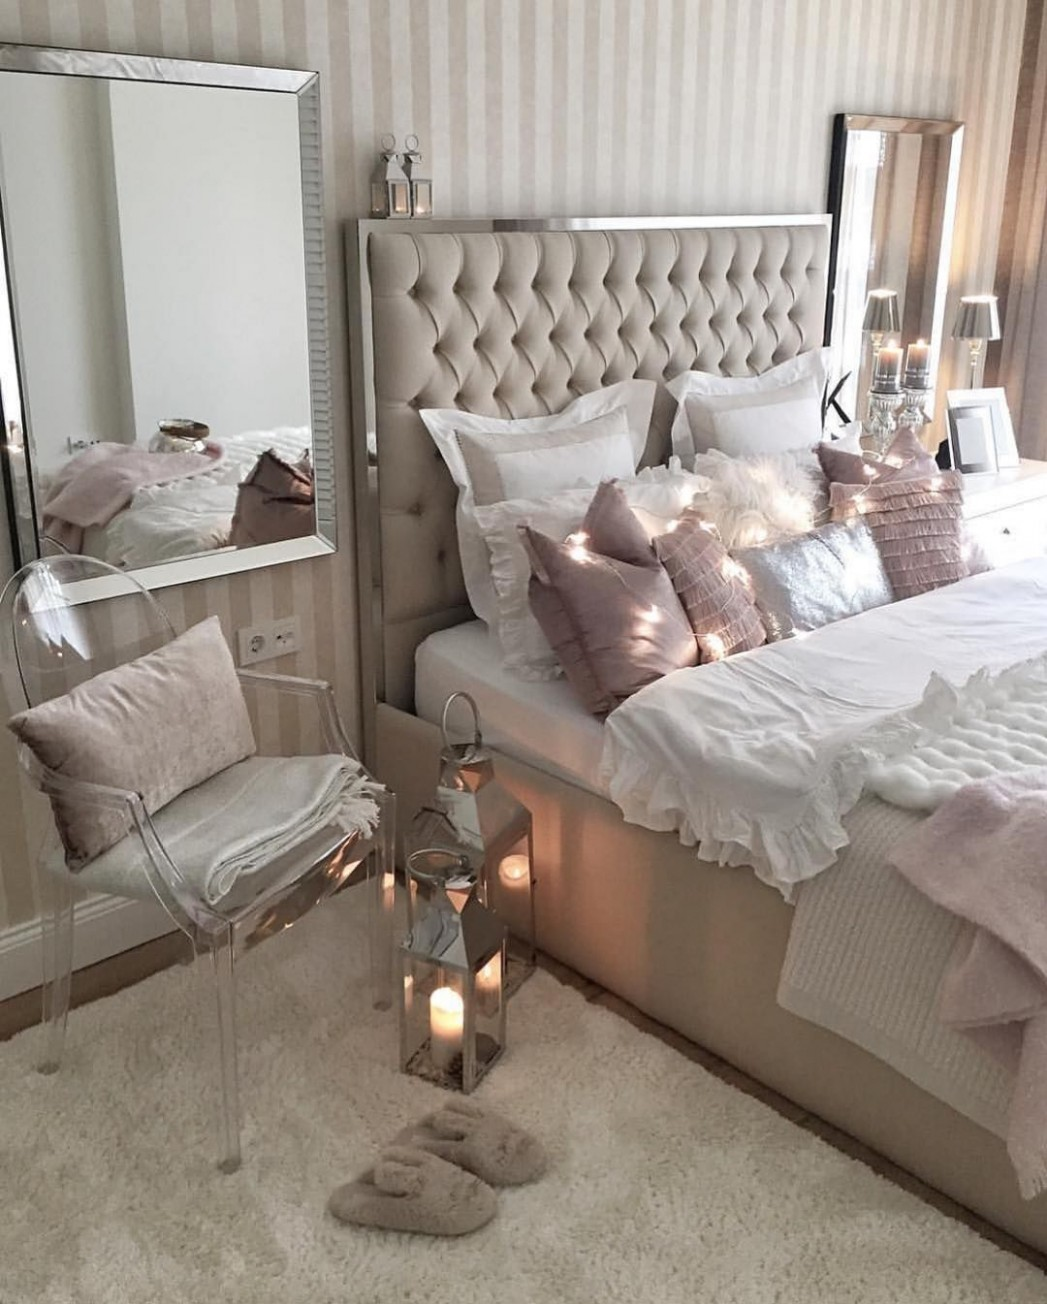 "Interior & Decor Inspiration on Instagram: ""Cozy bedroom vibes  - Bedroom Ideas Instagram"